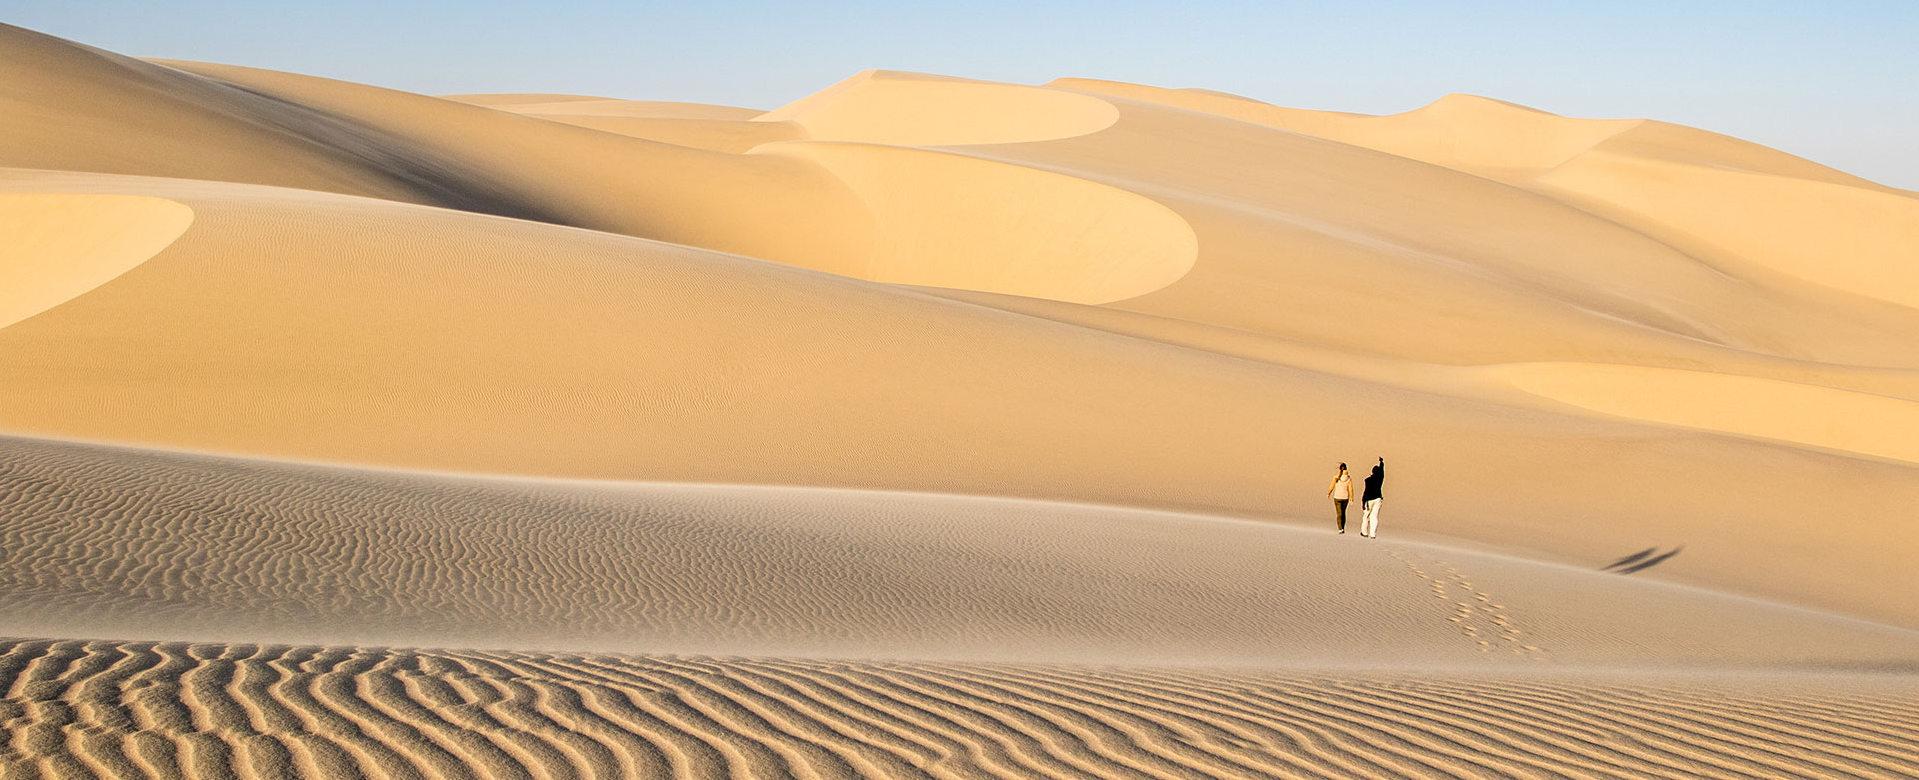 skeleton-coast-namibia-sand-dunes